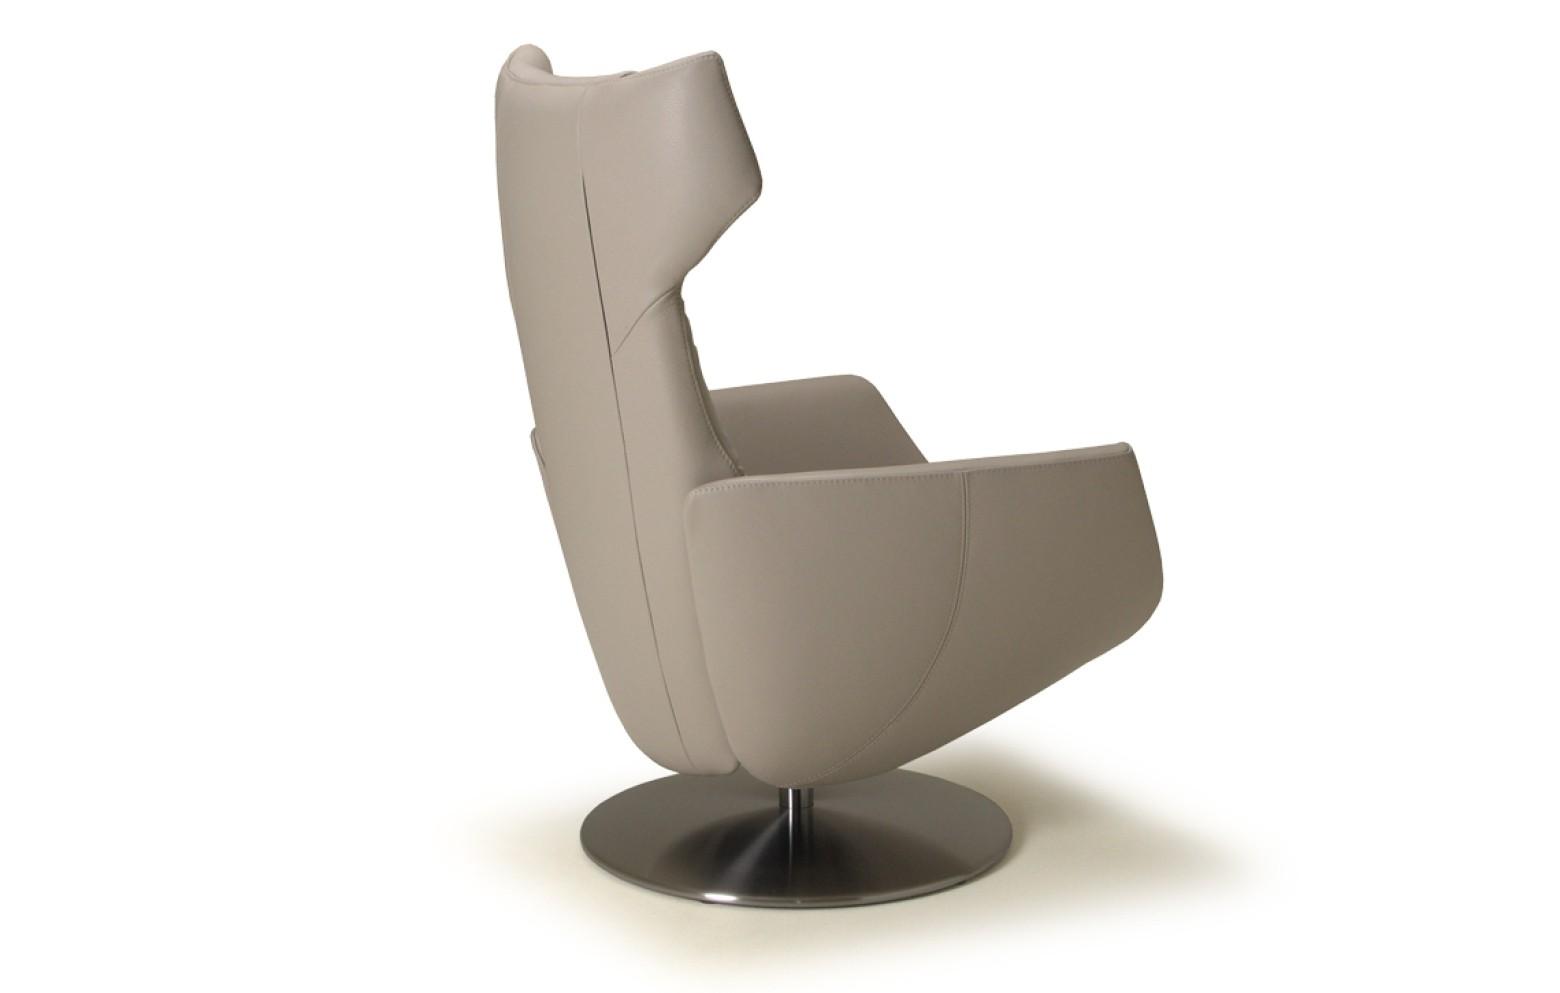 Relaxsessel designermöbel  TWICE Relaxsessel   Sessel & Liegen   Polstermöbel   Who's perfect.